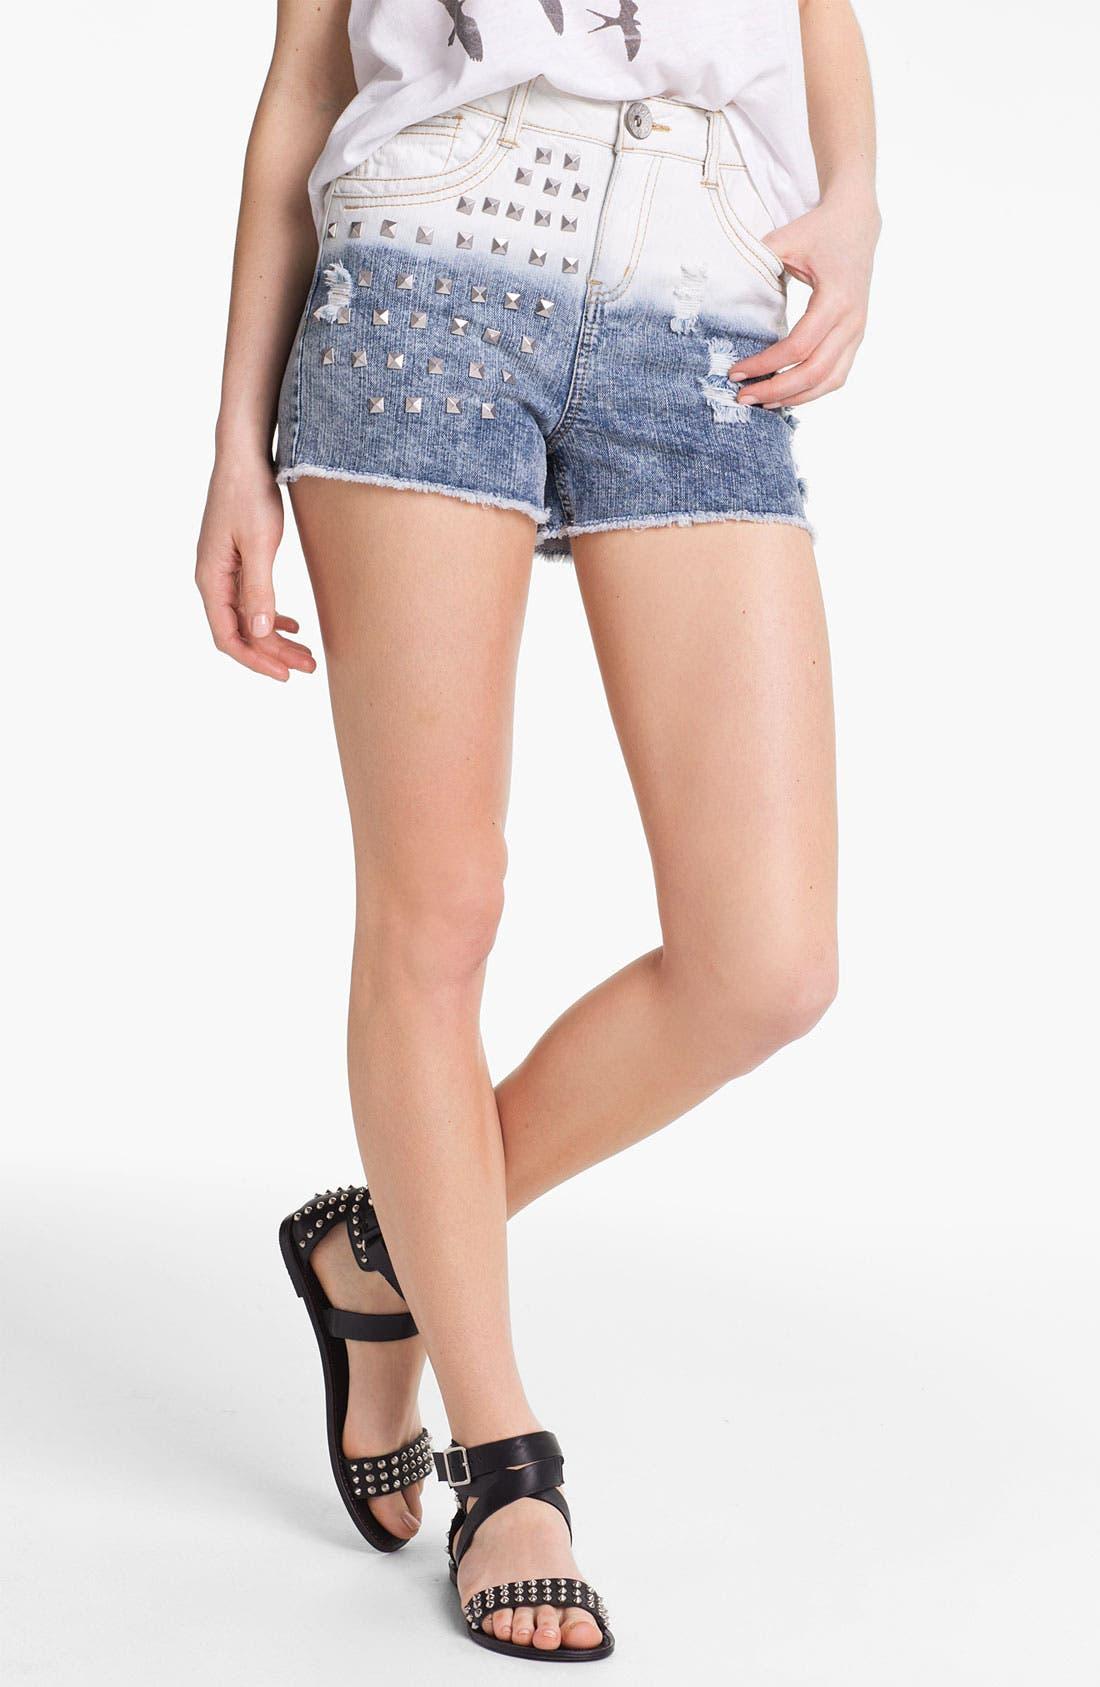 Alternate Image 1 Selected - Jolt Stud Dip Dye High Waist Denim Shorts (Juniors)